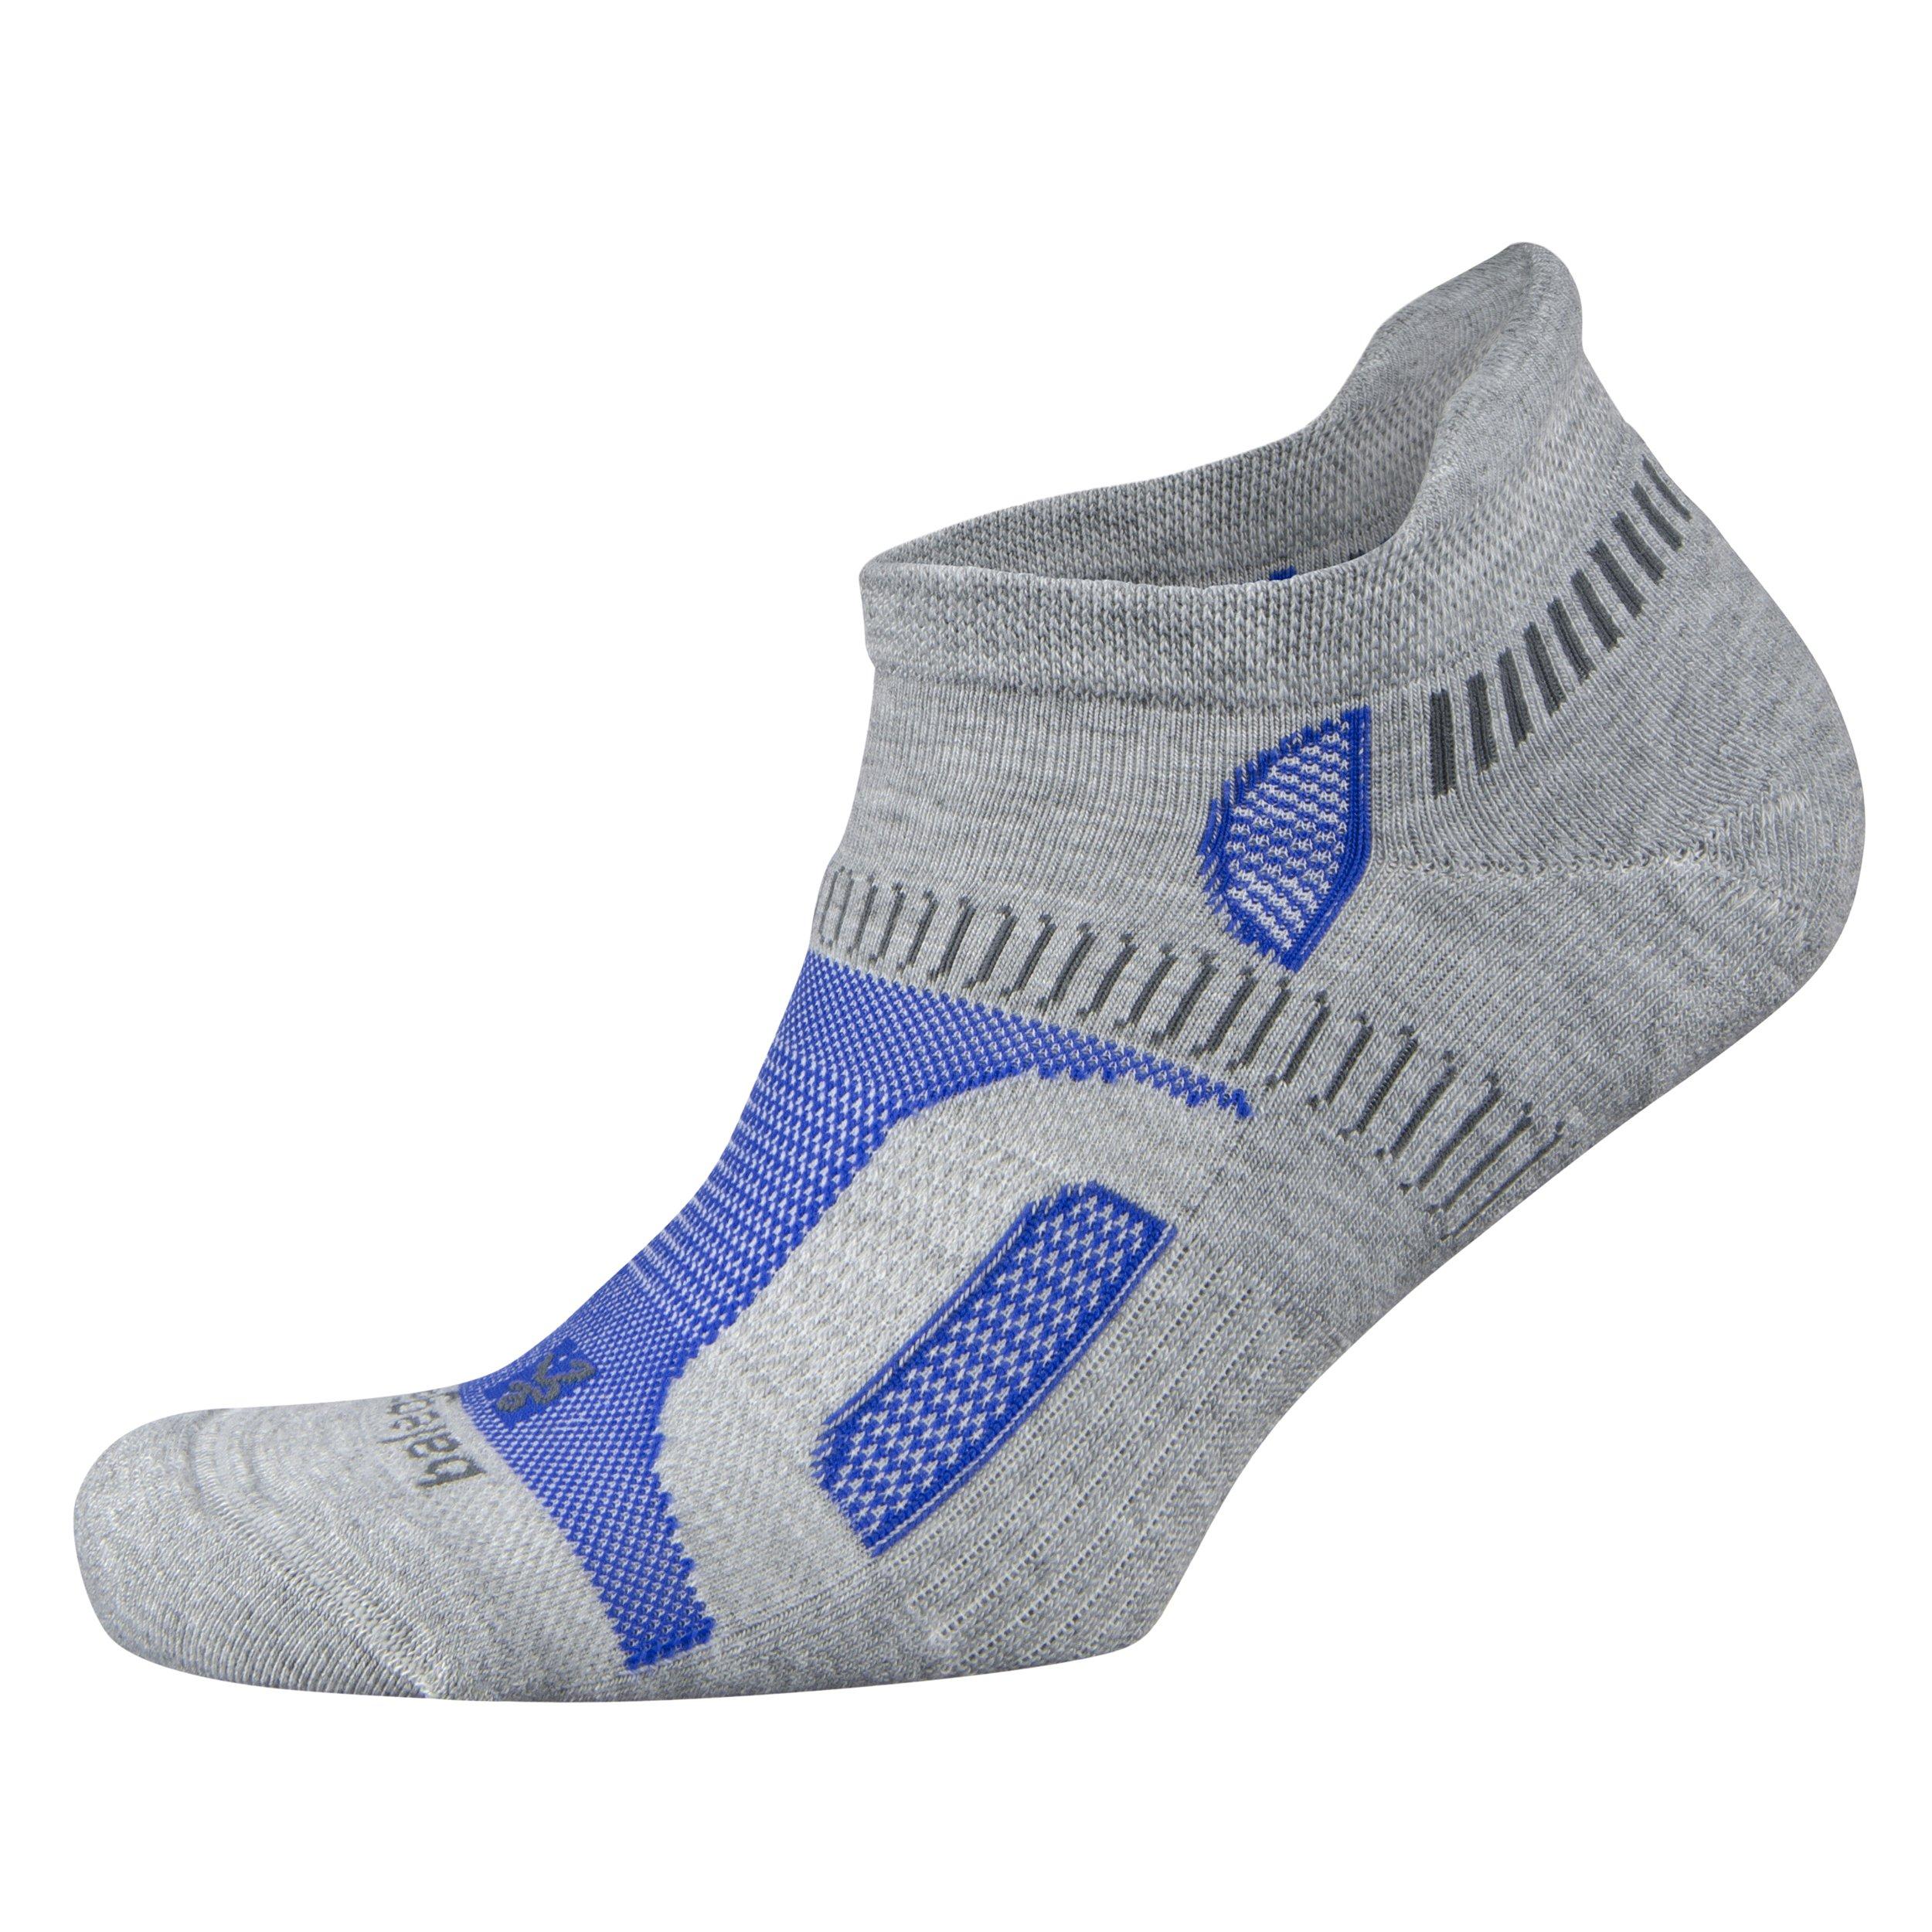 Balega Hidden Contour Socks, Light Grey, X-Large